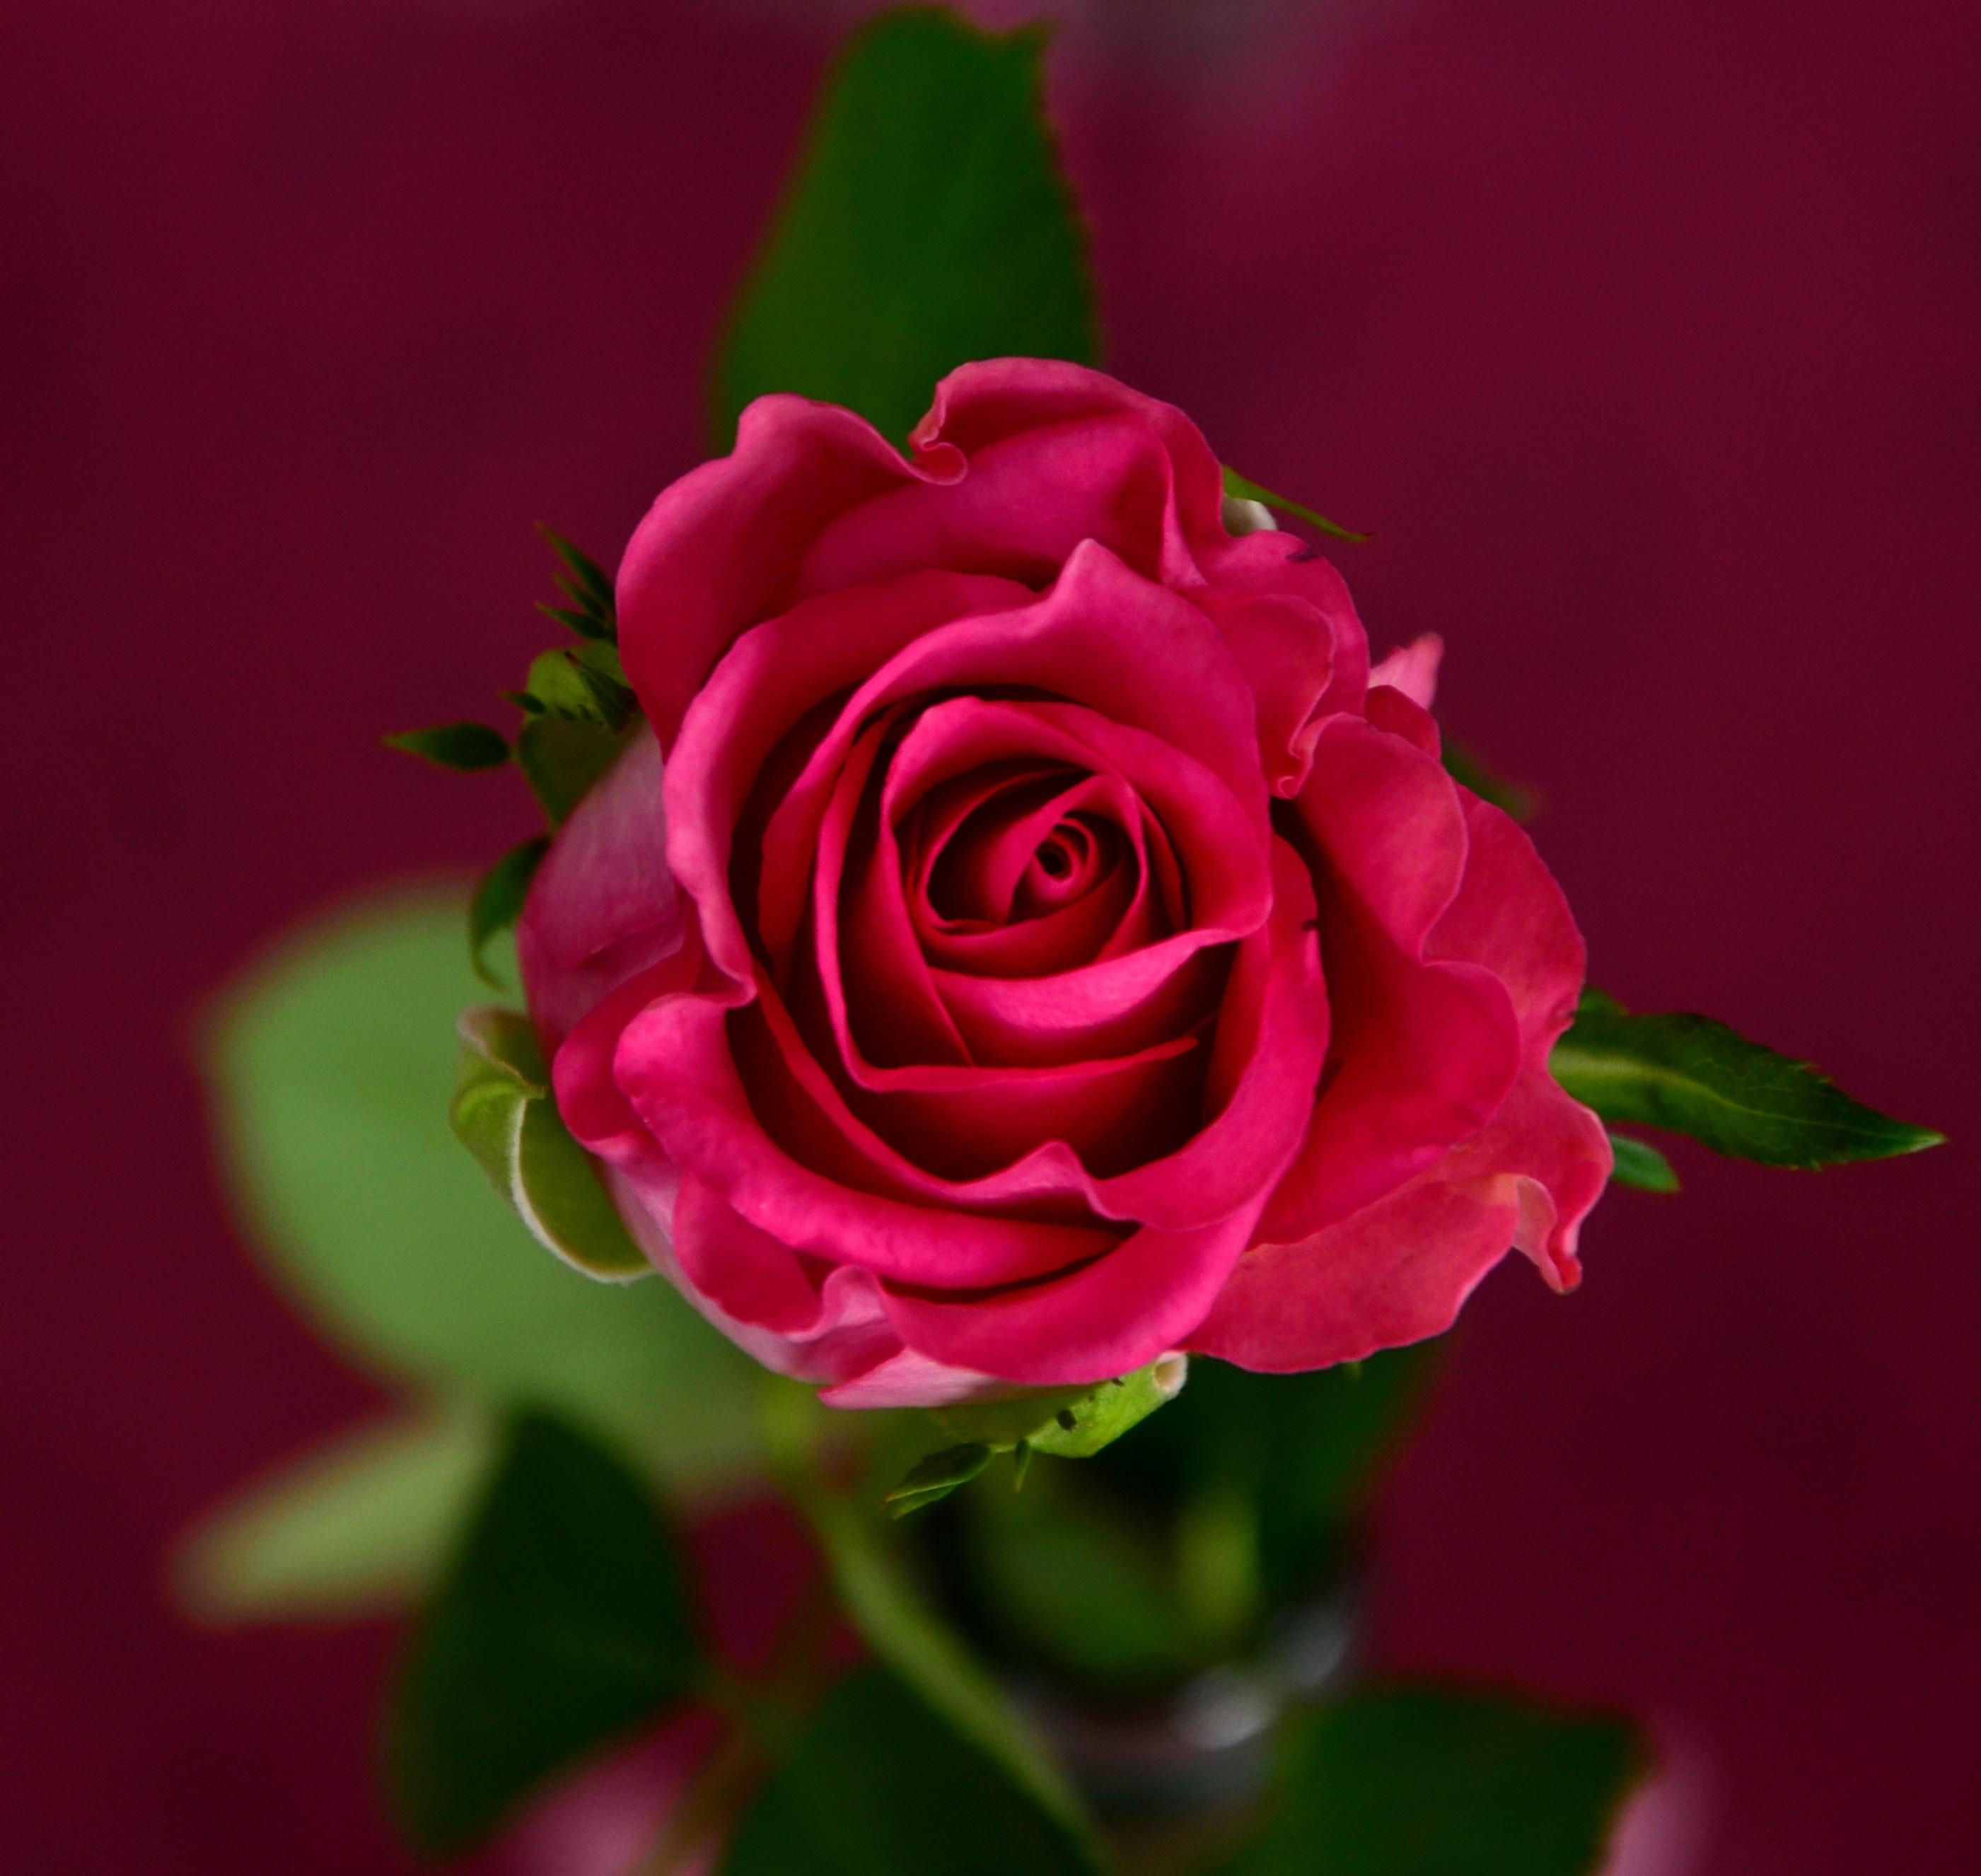 blossom plant flower petal bloom rose red pink flora close up roses floristry floribunda macro photography